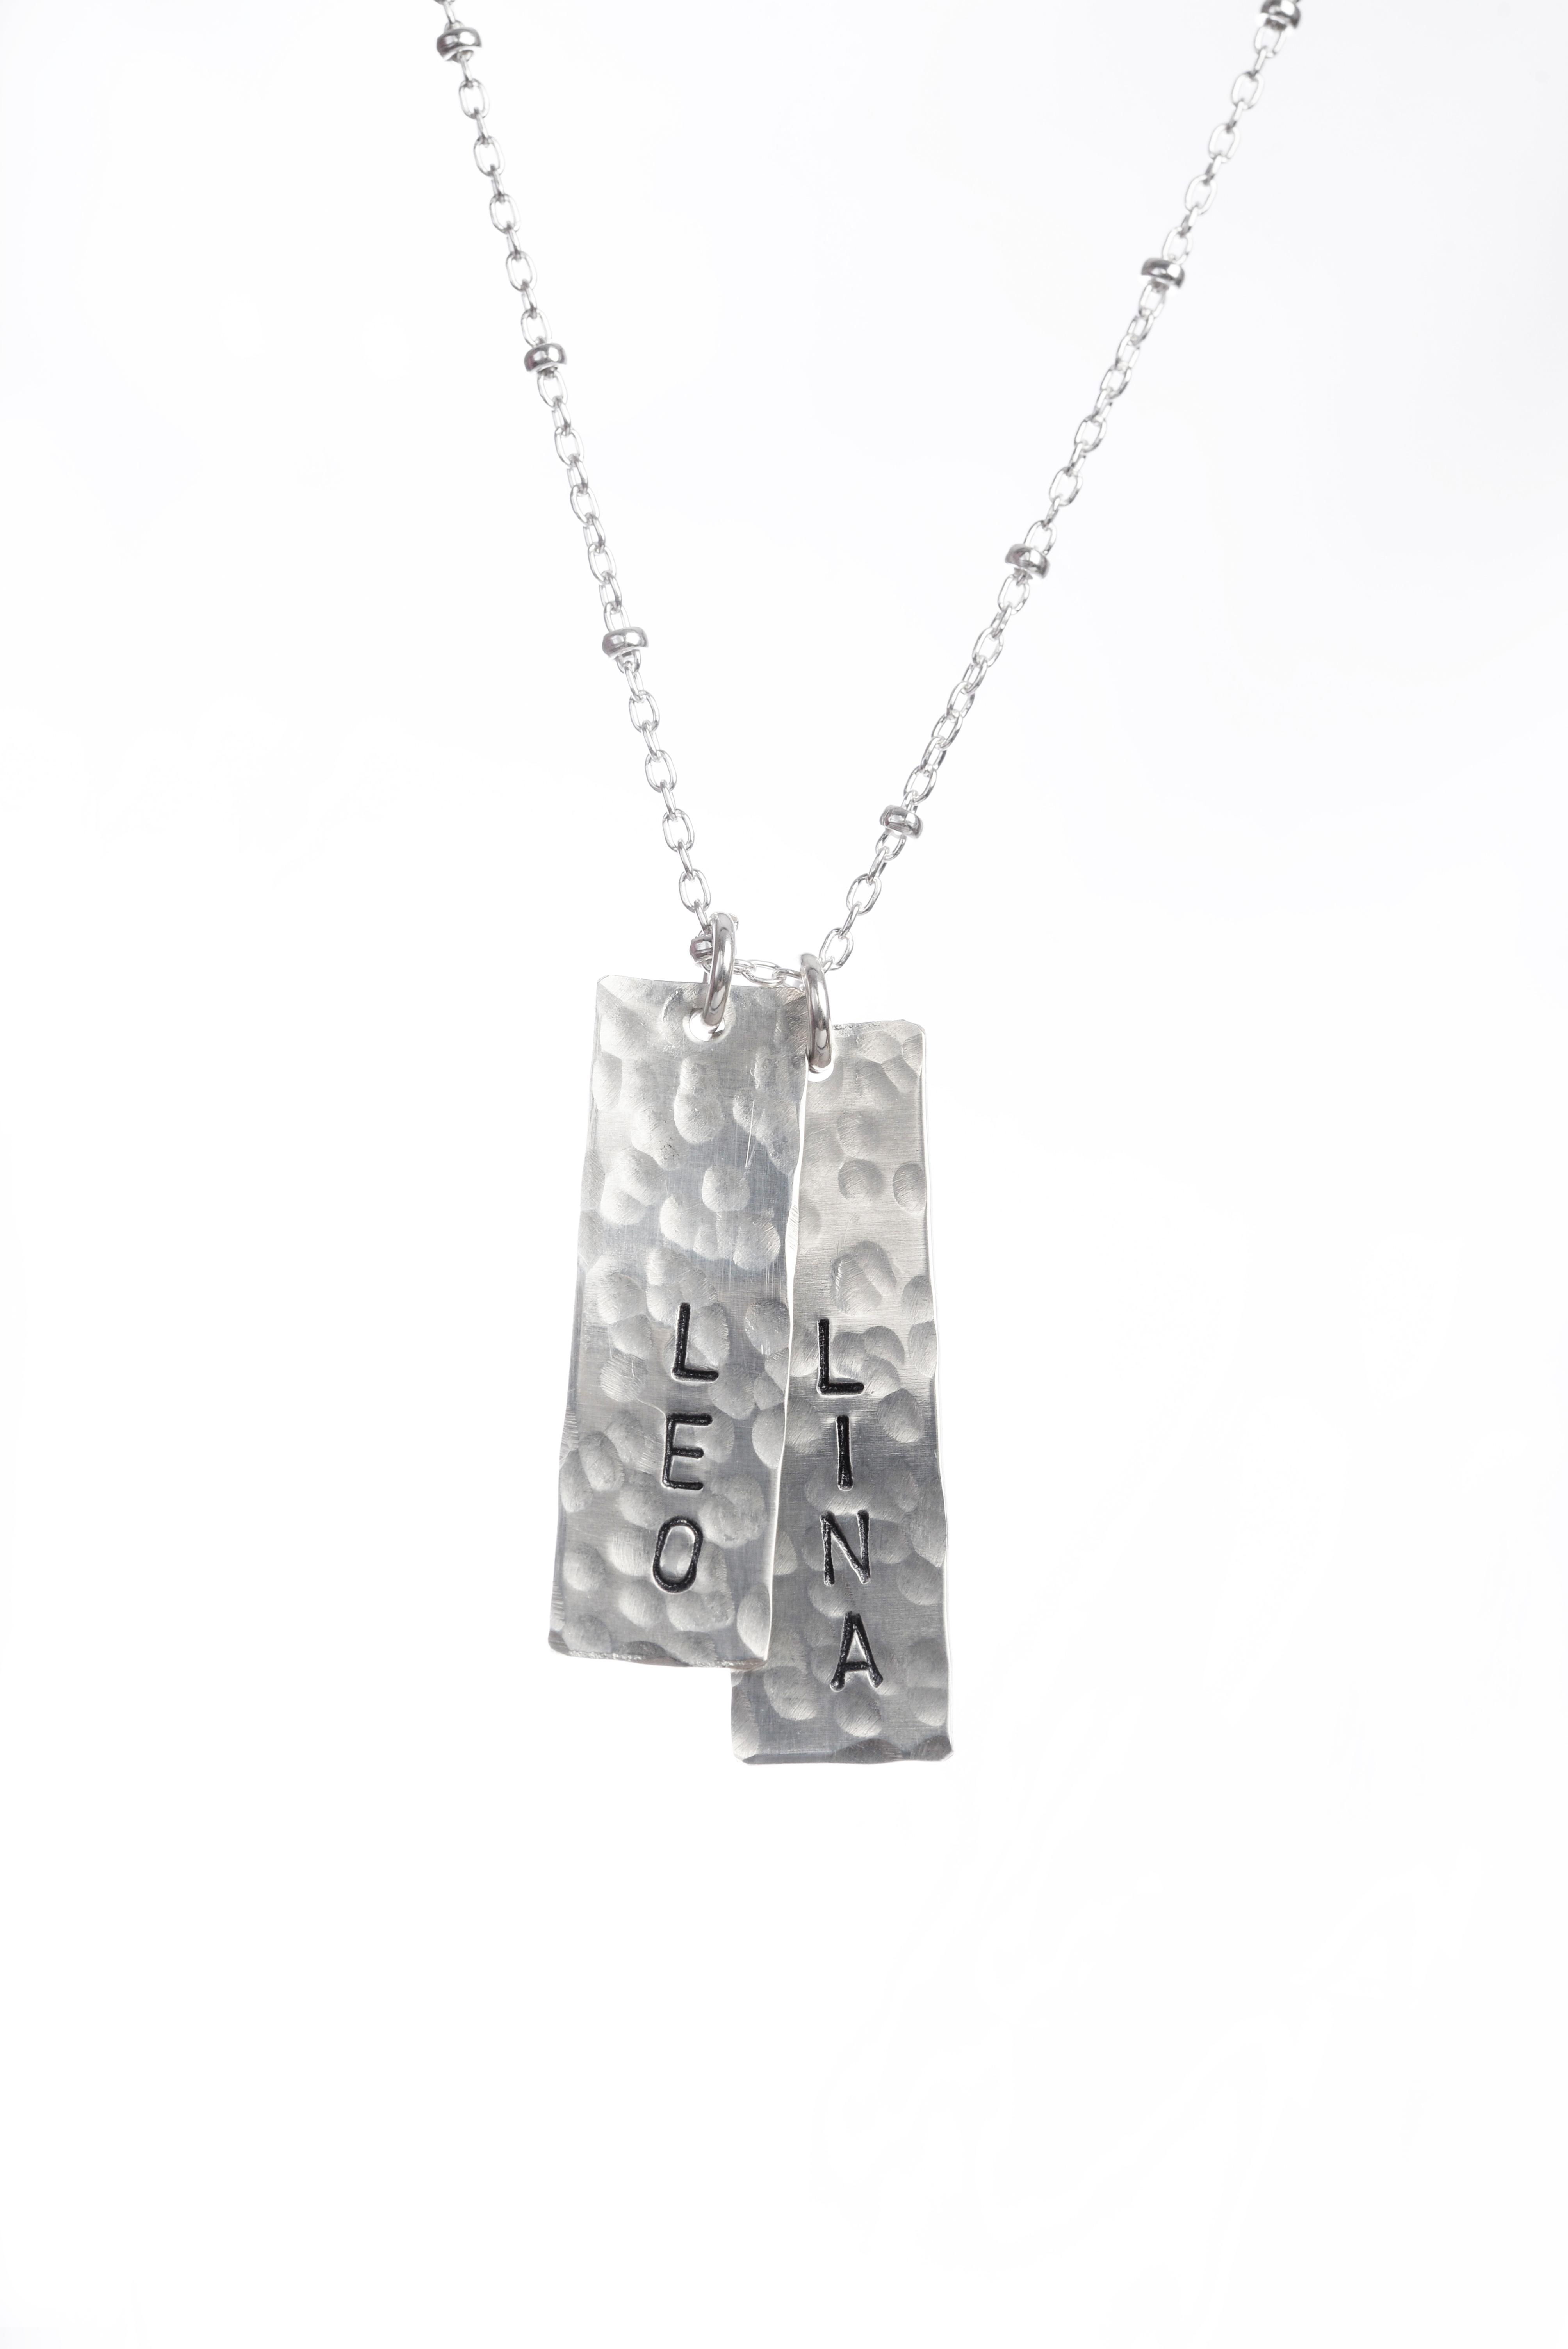 Personalized Name Necklace Erin Pelicano